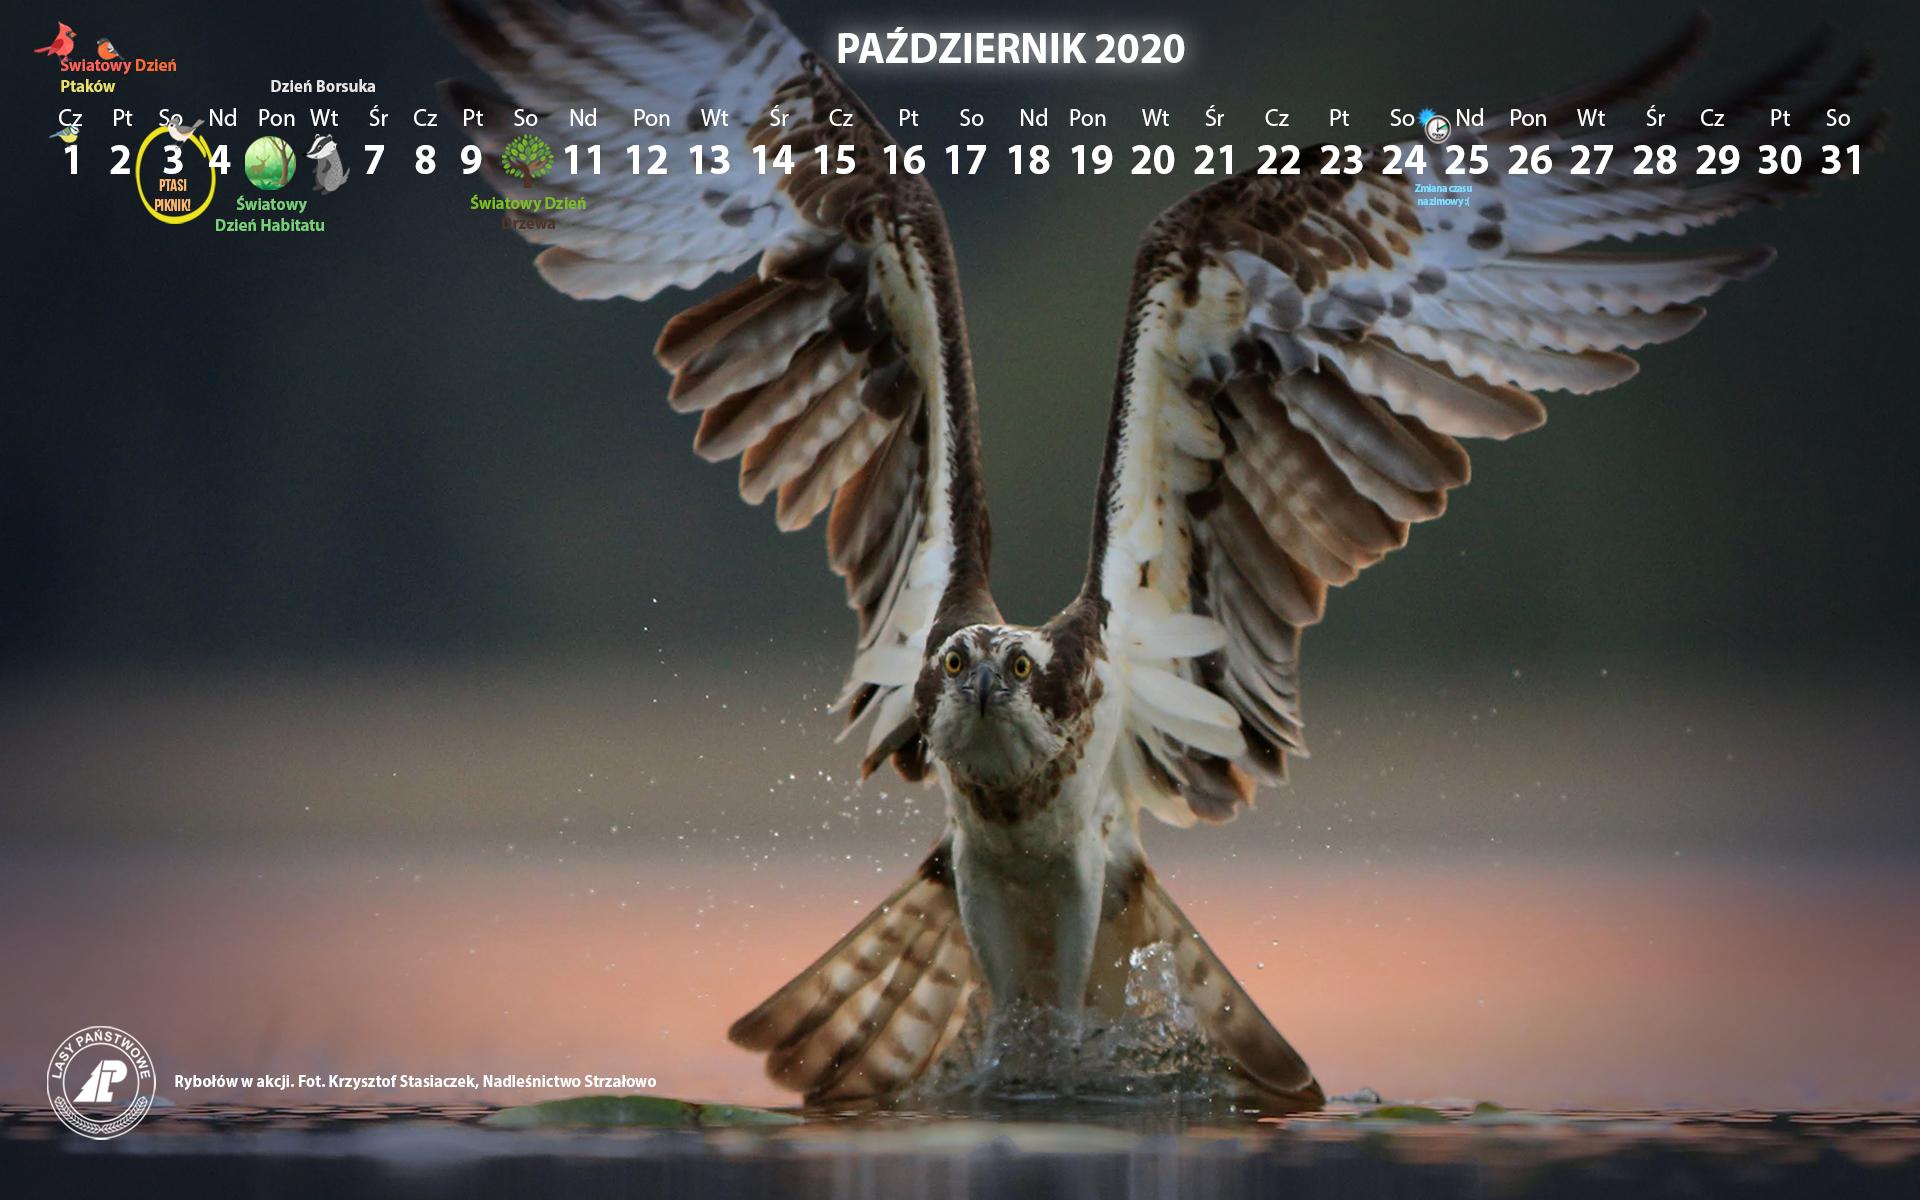 Kalendarz_1920X1200_PAŹDZIERNIK_2020[1].jpg